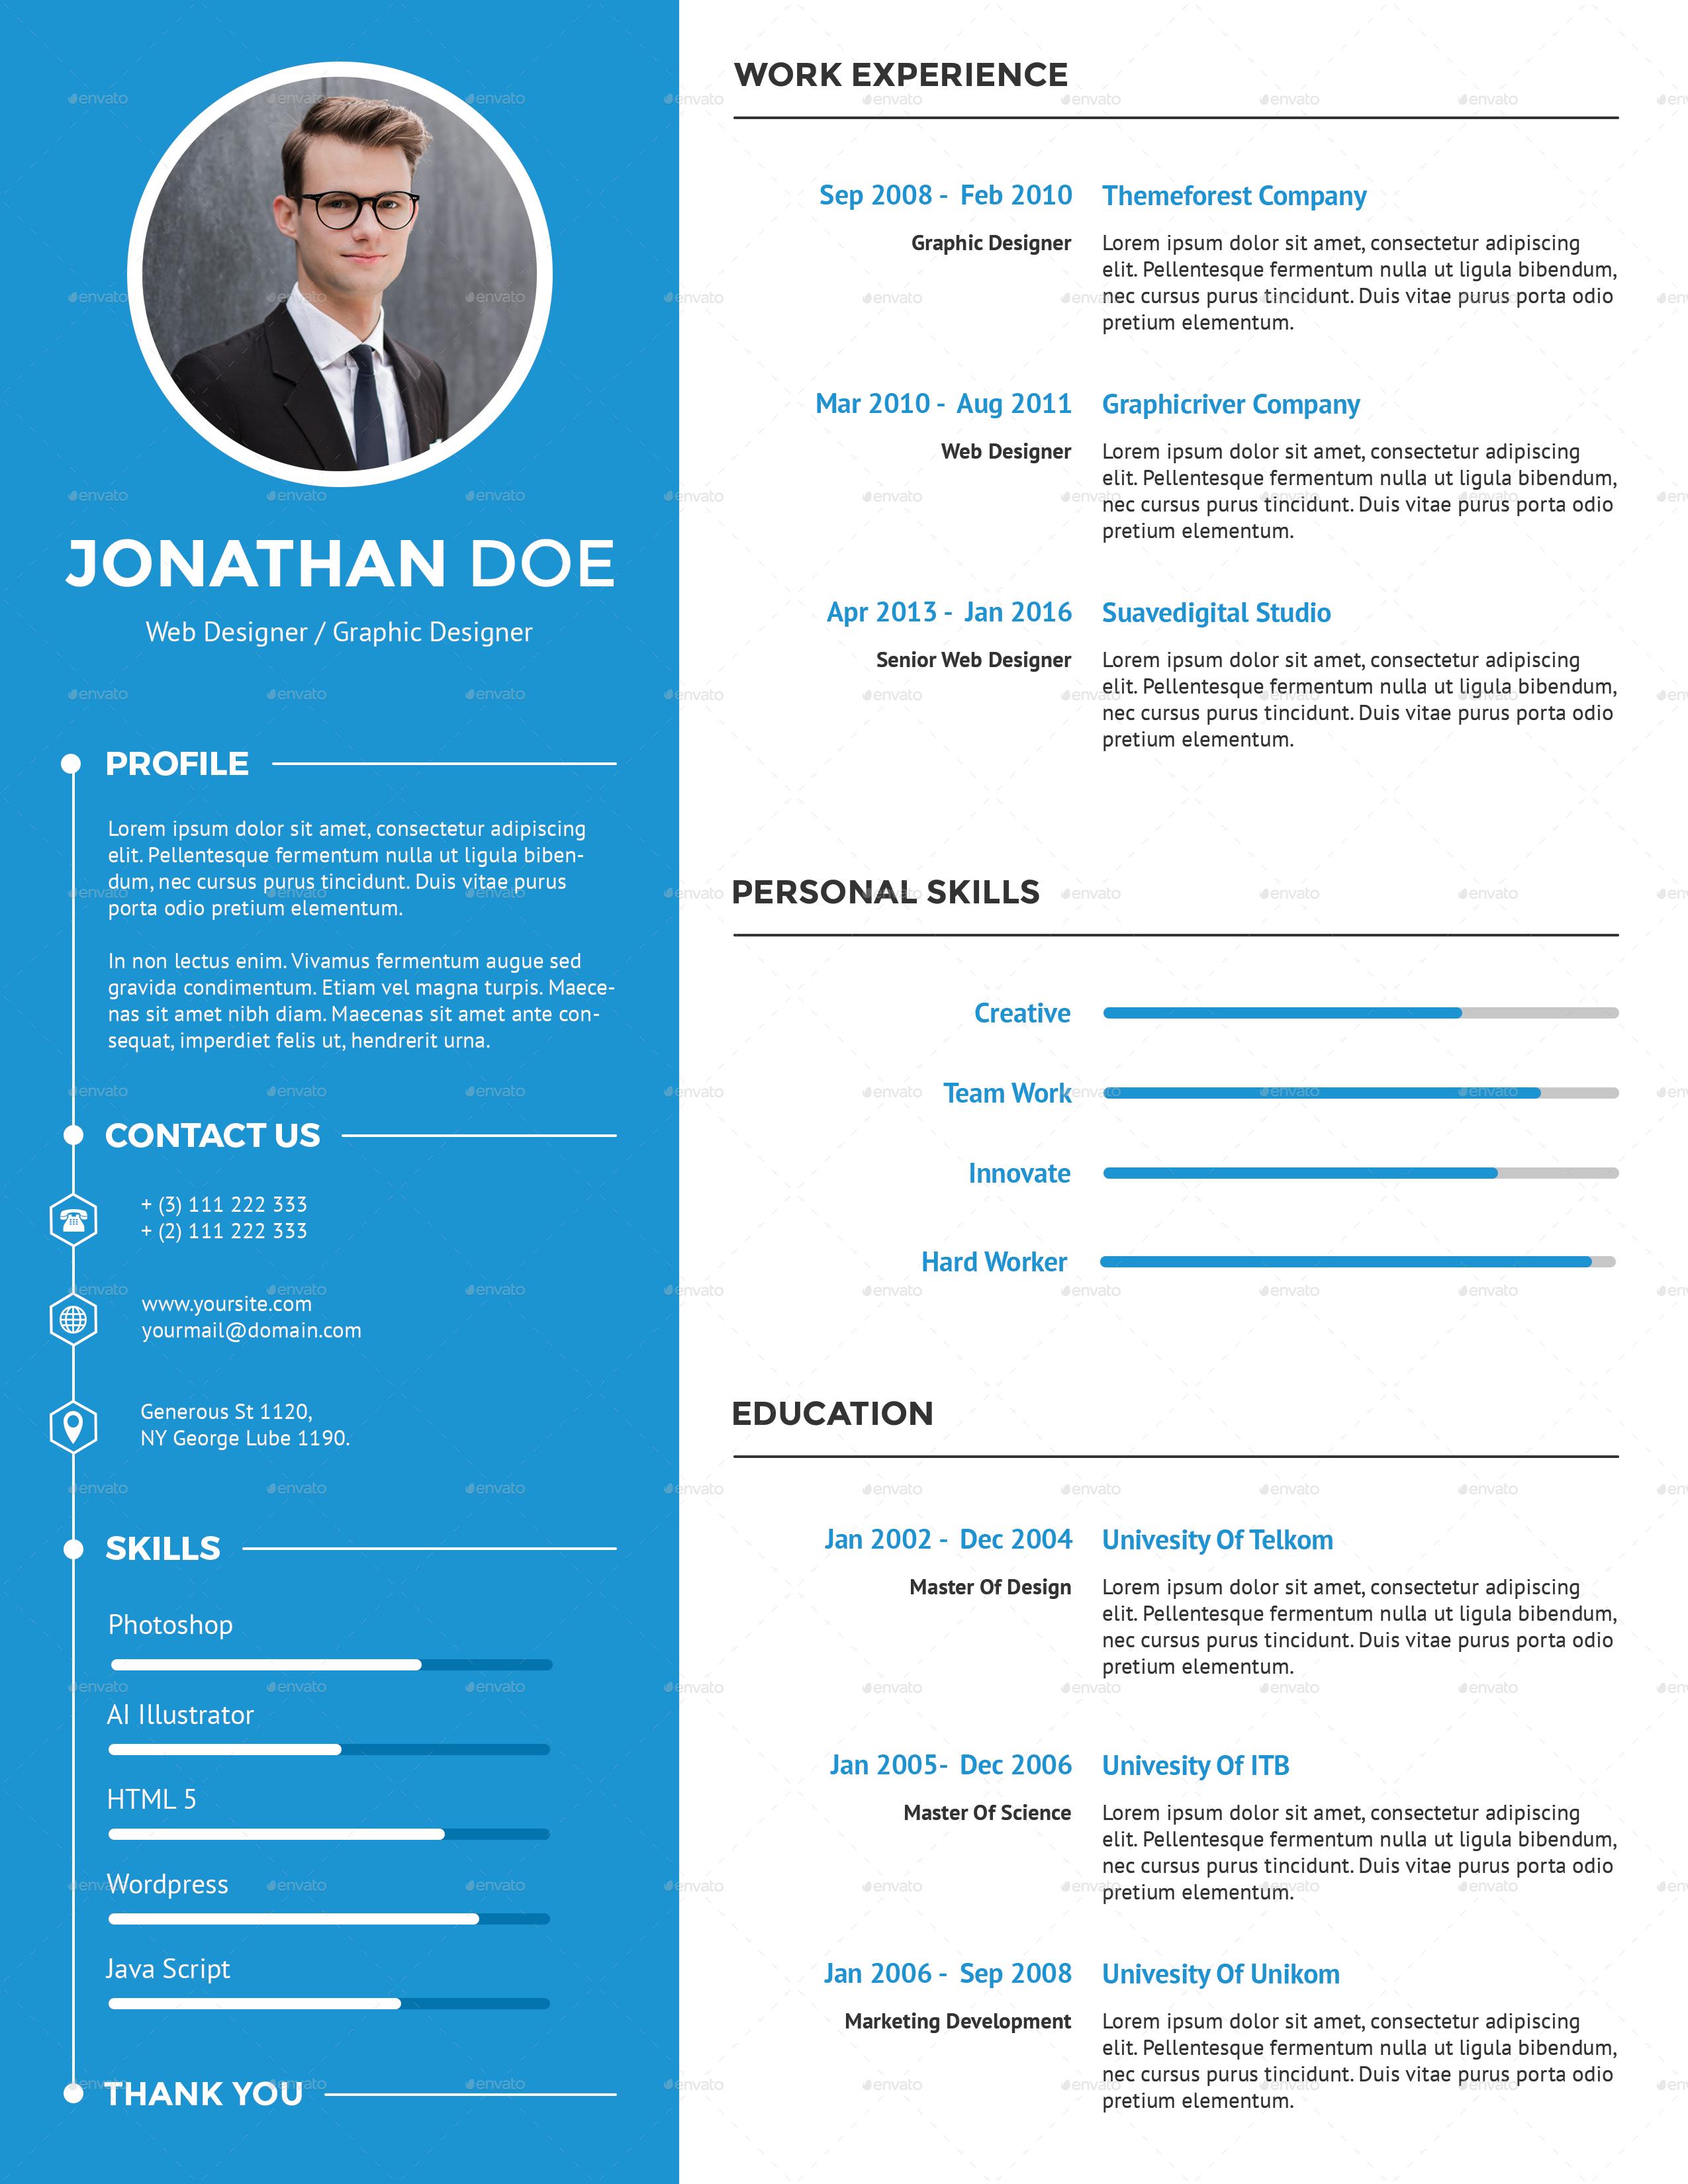 Clean Creative Resume Creative Resume Free Resume Template Word Clean Resume Template